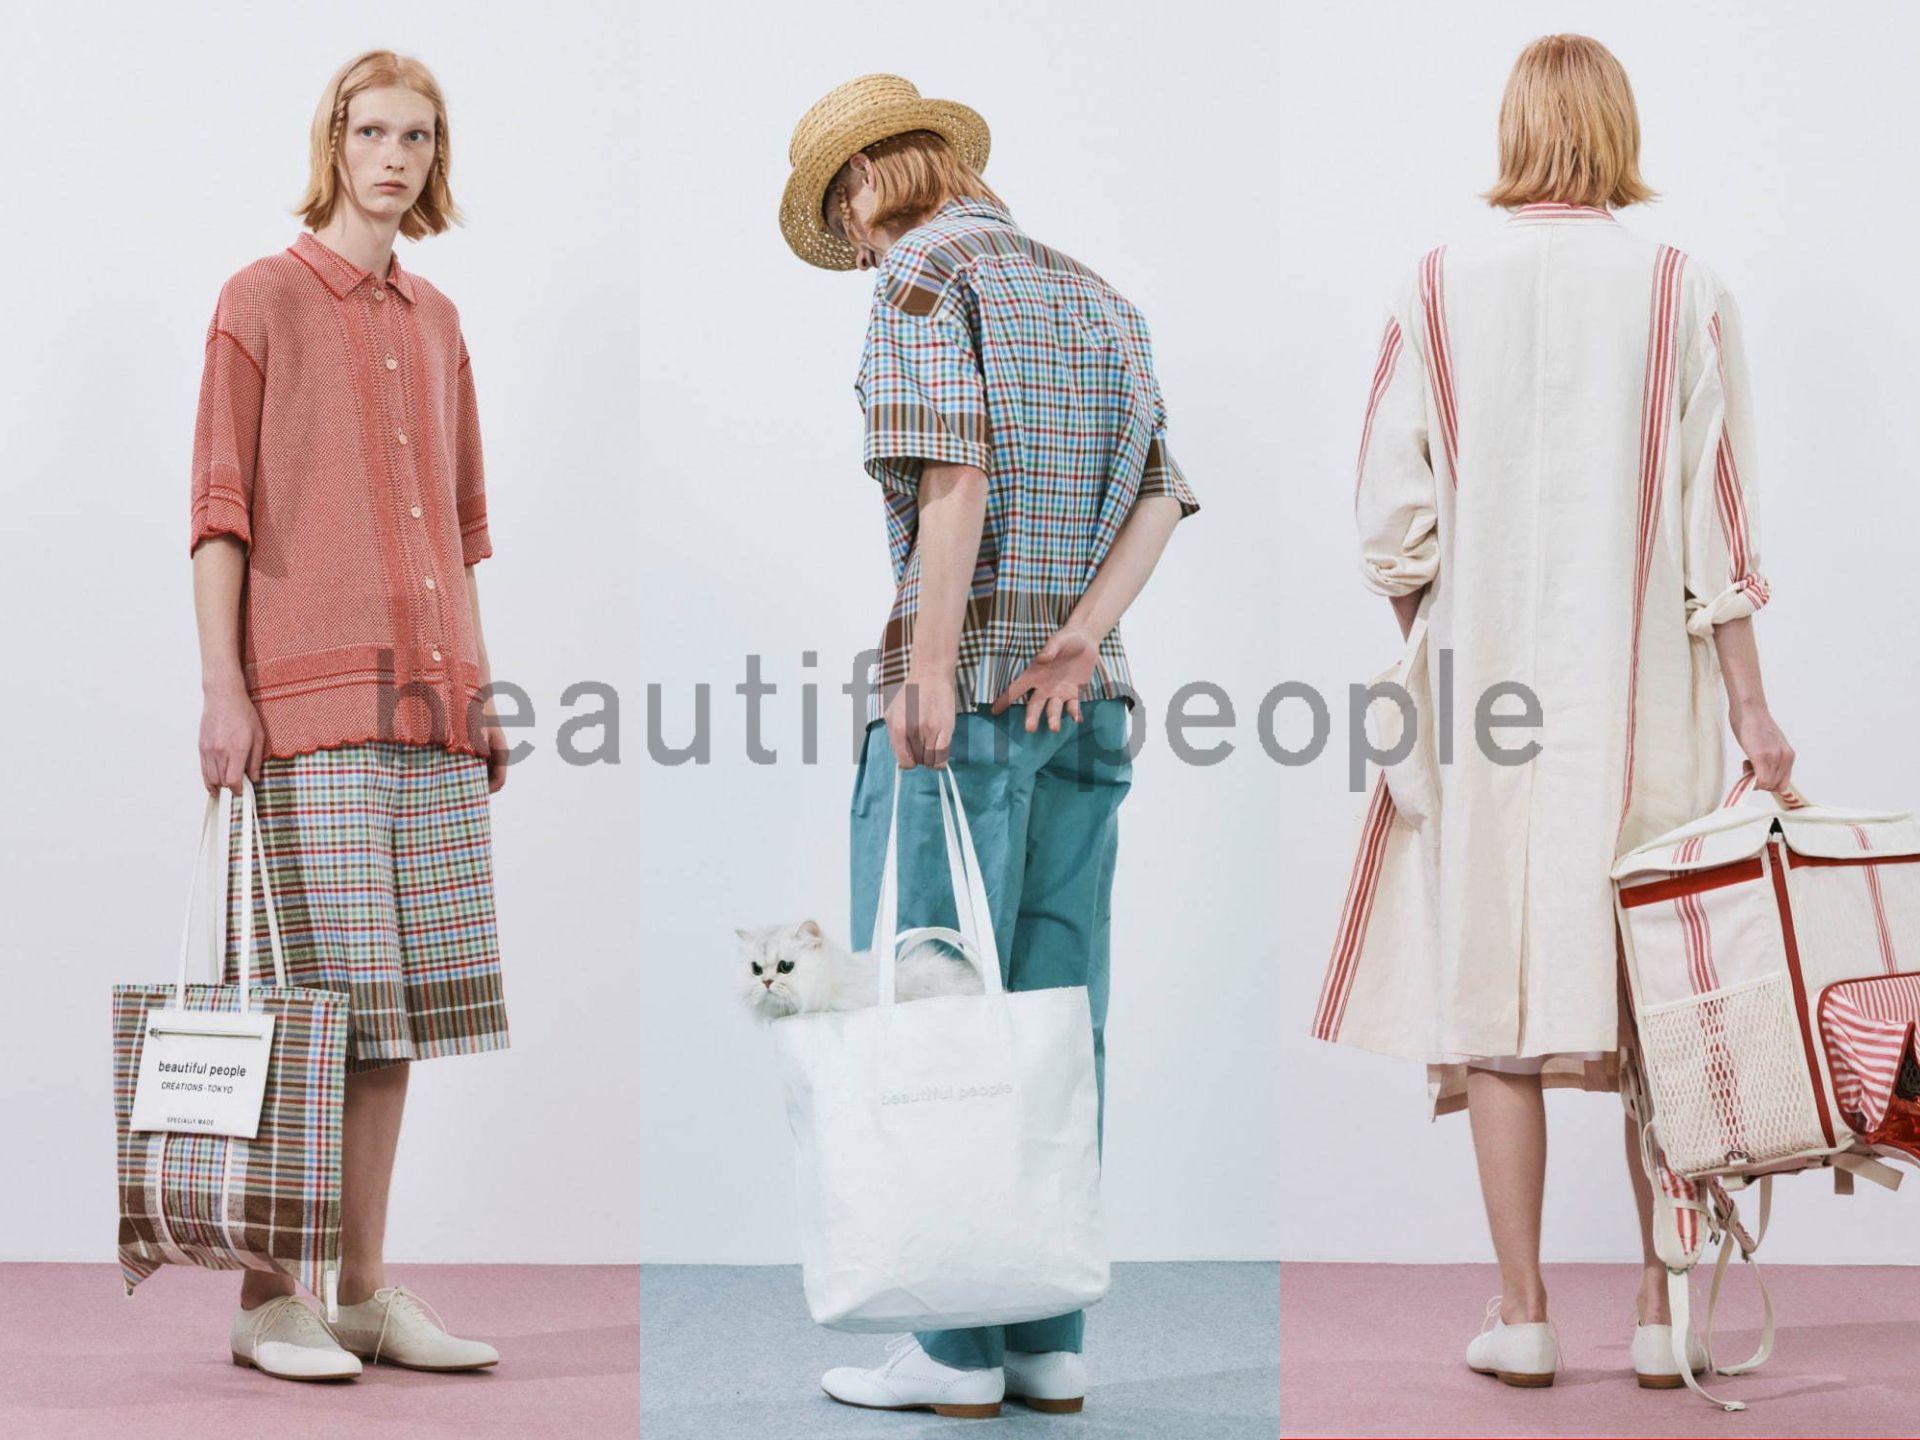 beautiful people(ビューティフルピープル)